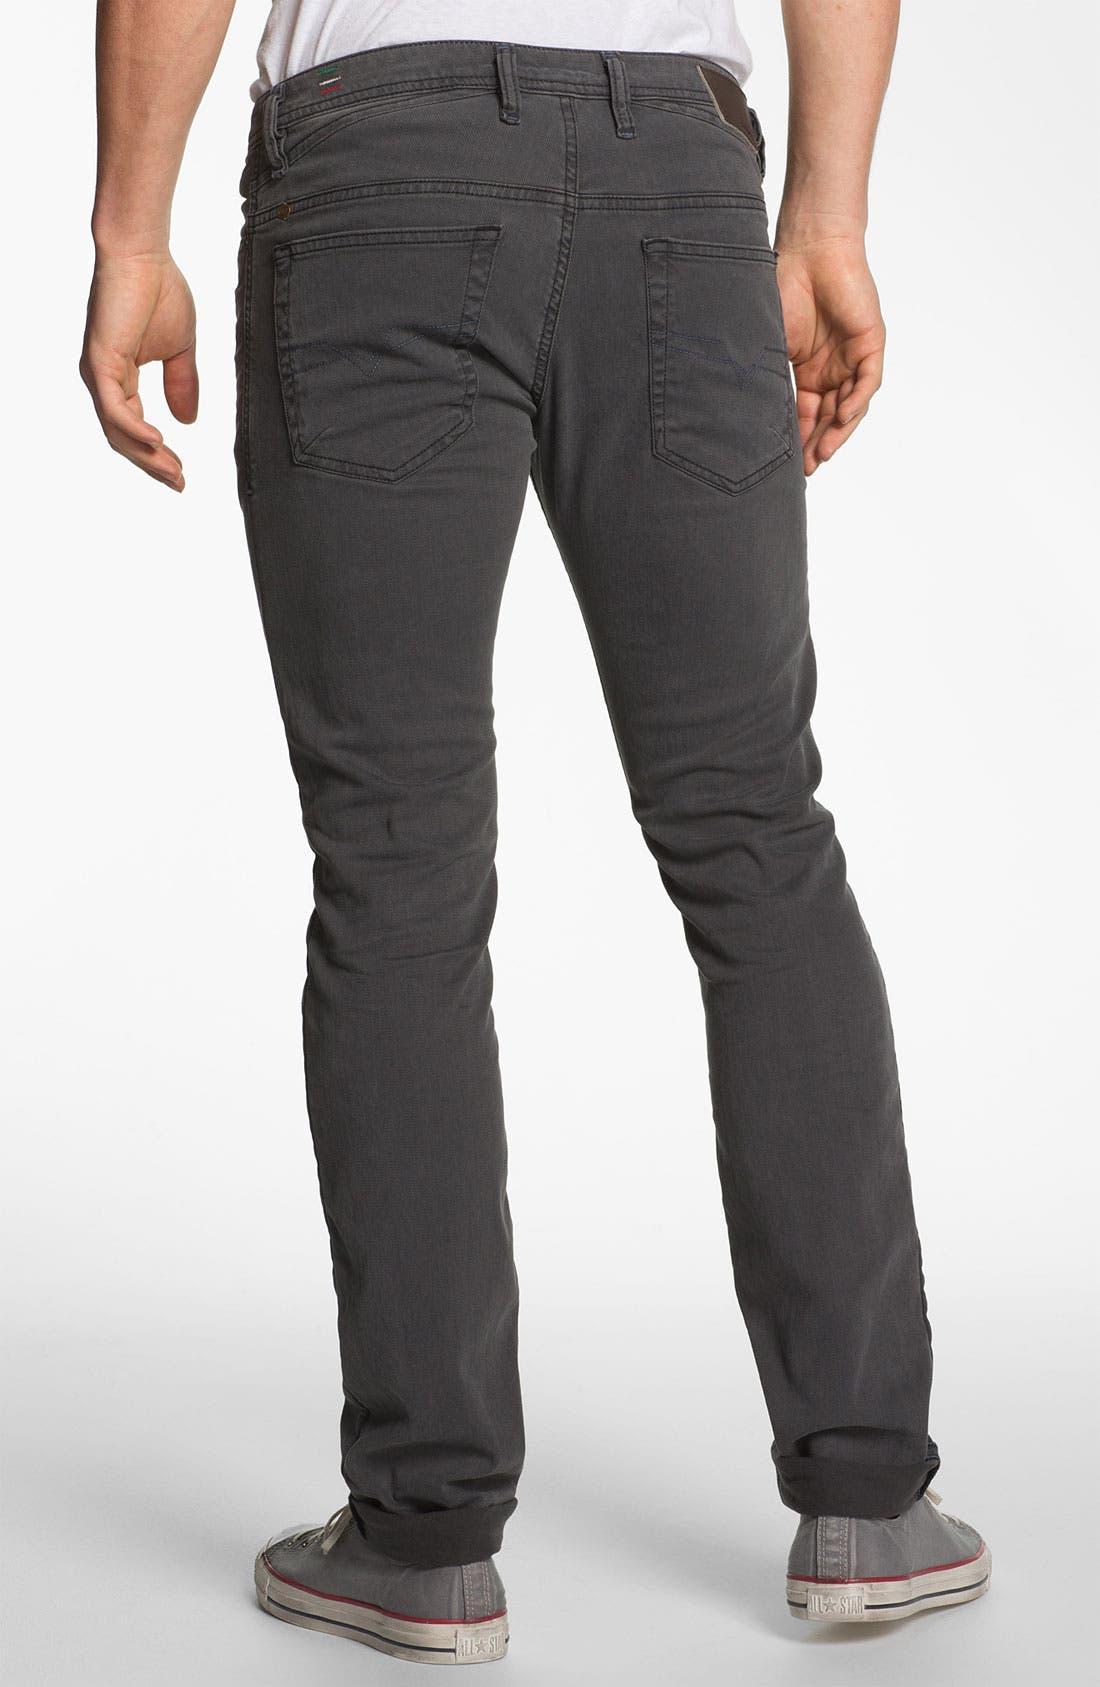 Alternate Image 1 Selected - DIESEL® 'Shioner' Slim Straight Leg Jeans